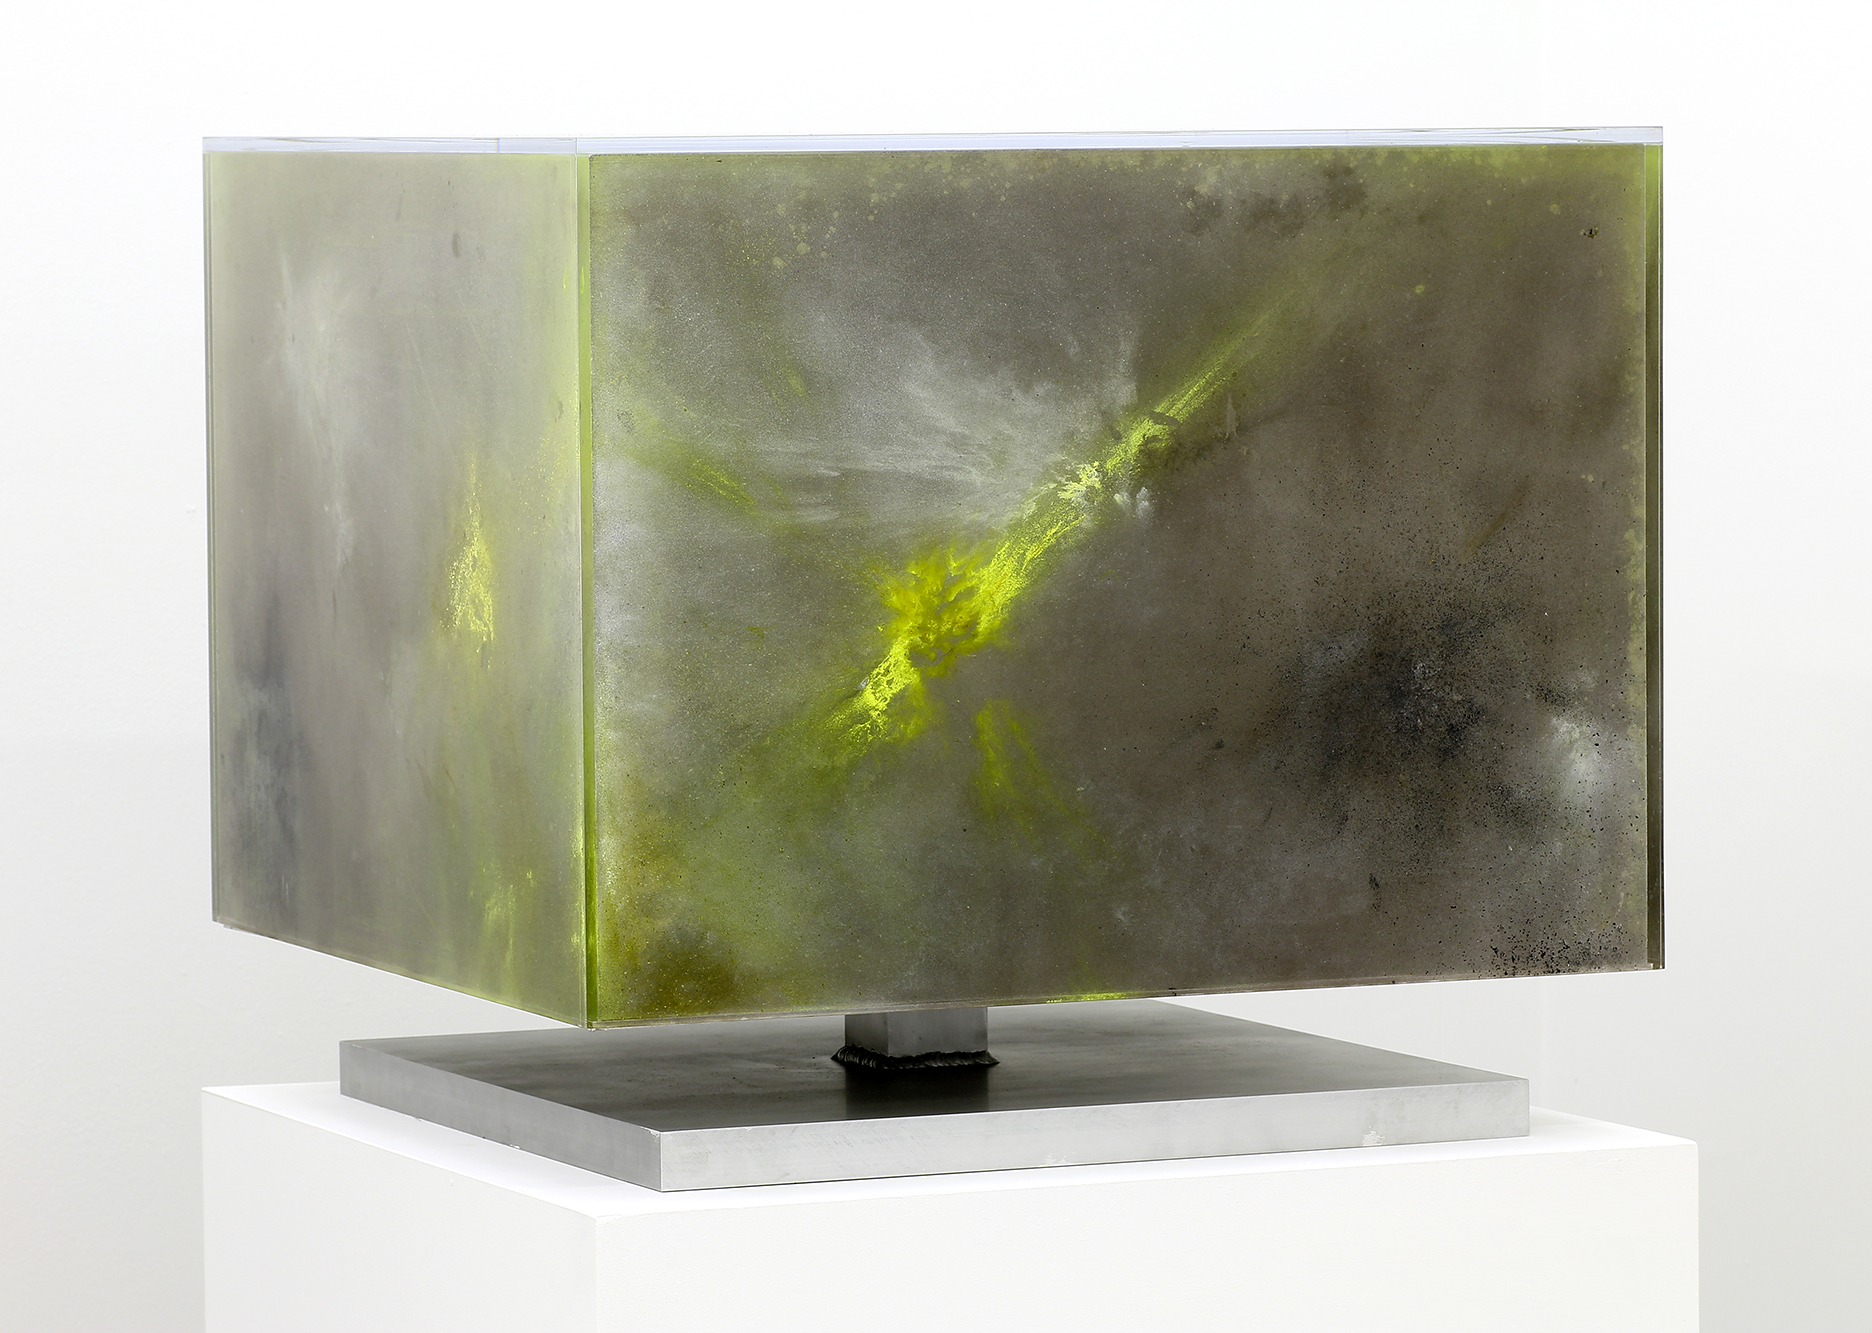 modern ensembles by geof oppenheimer 2010